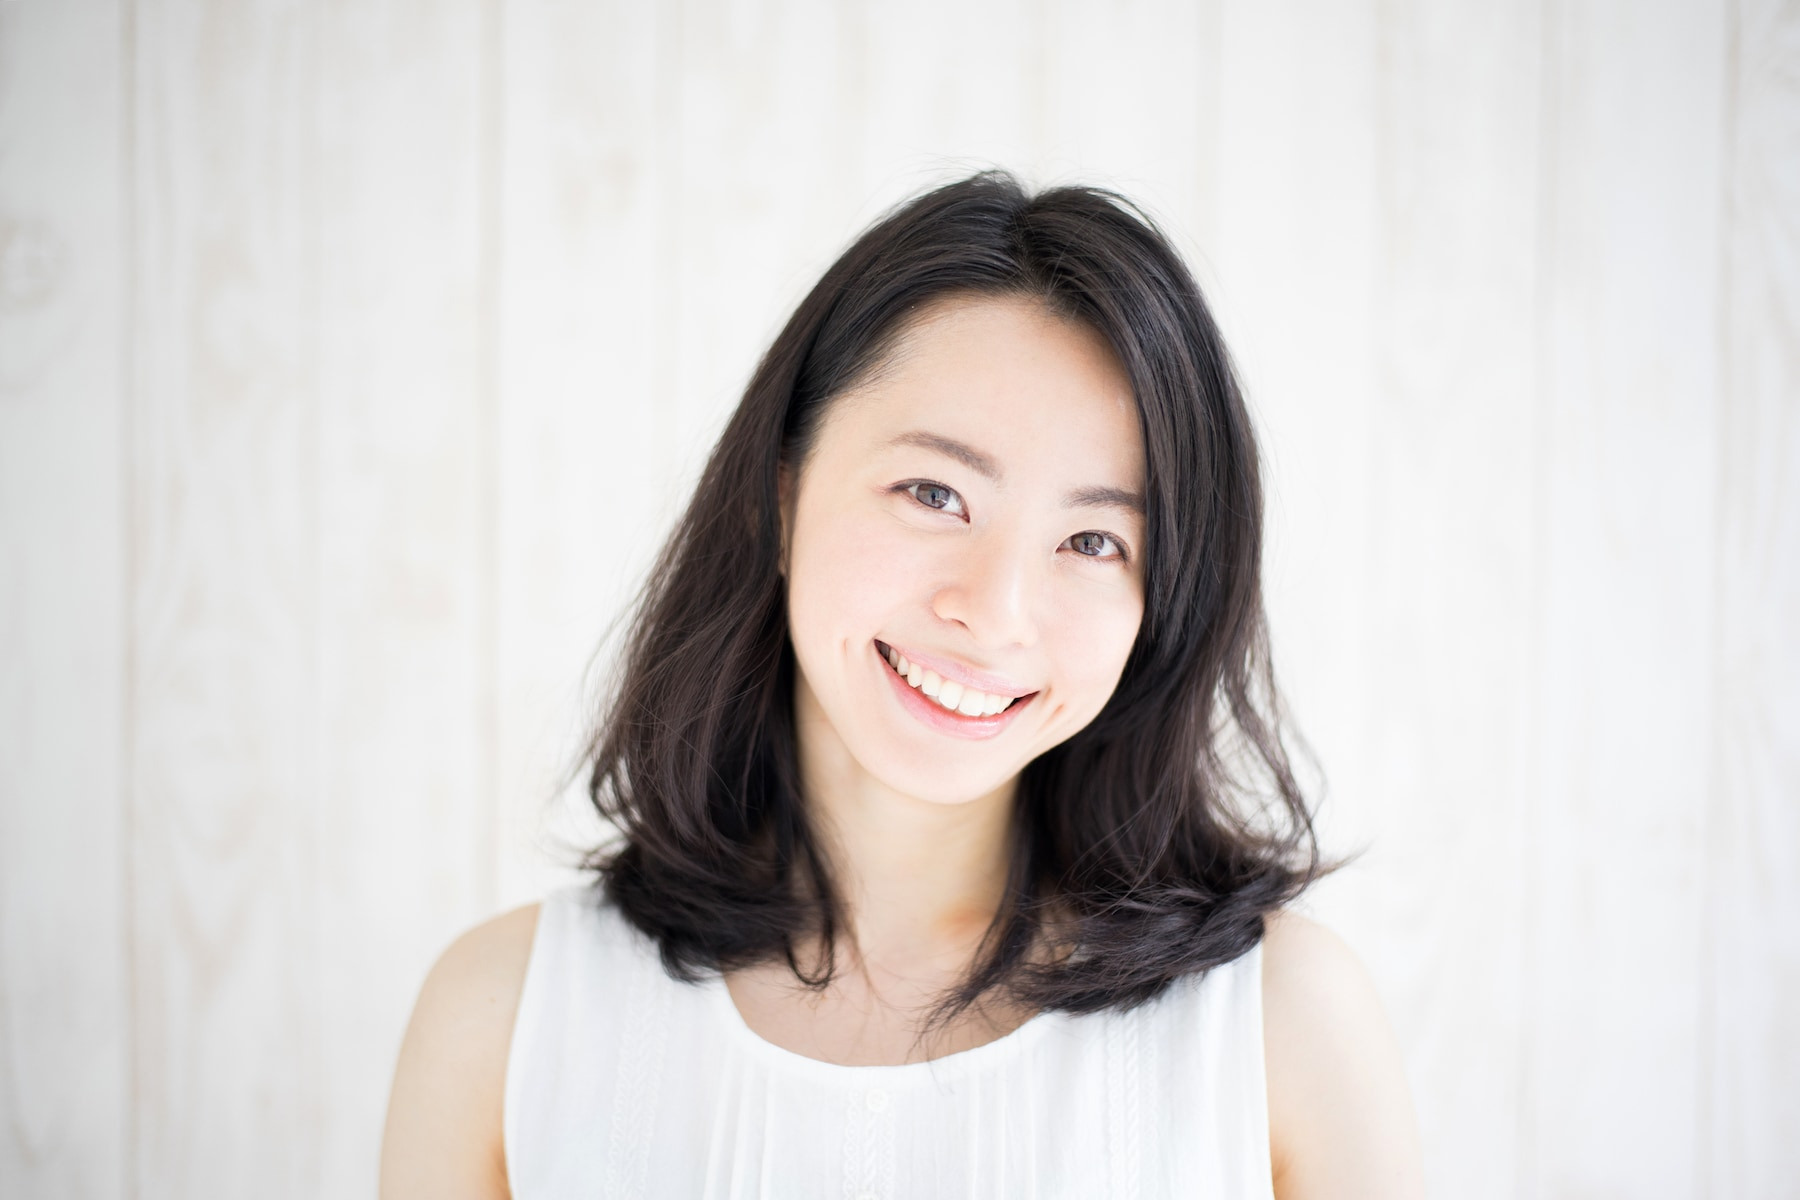 Wanita asia dengan model rambut sebahu untuk wajah bulat